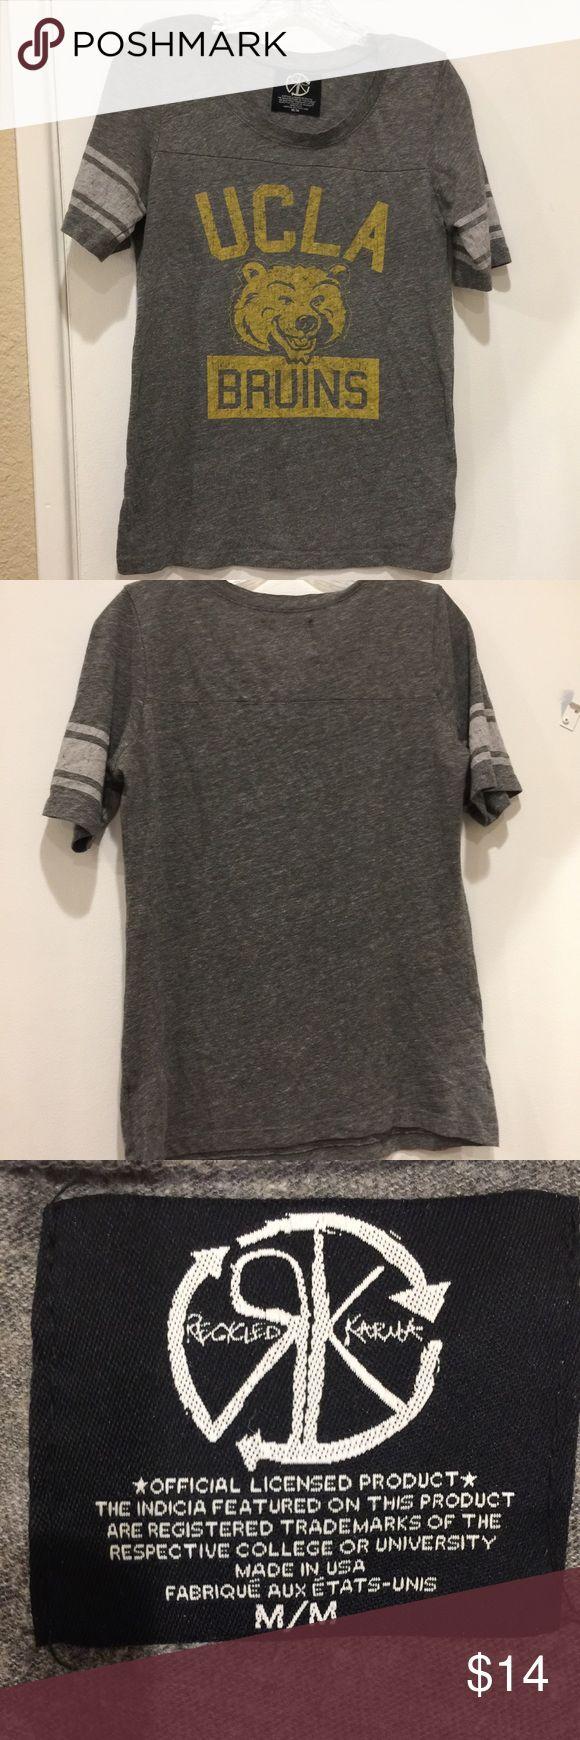 Women's UCLA Bruins Football Tee Shirt In very good condition ucla Tops Tees - Short Sleeve